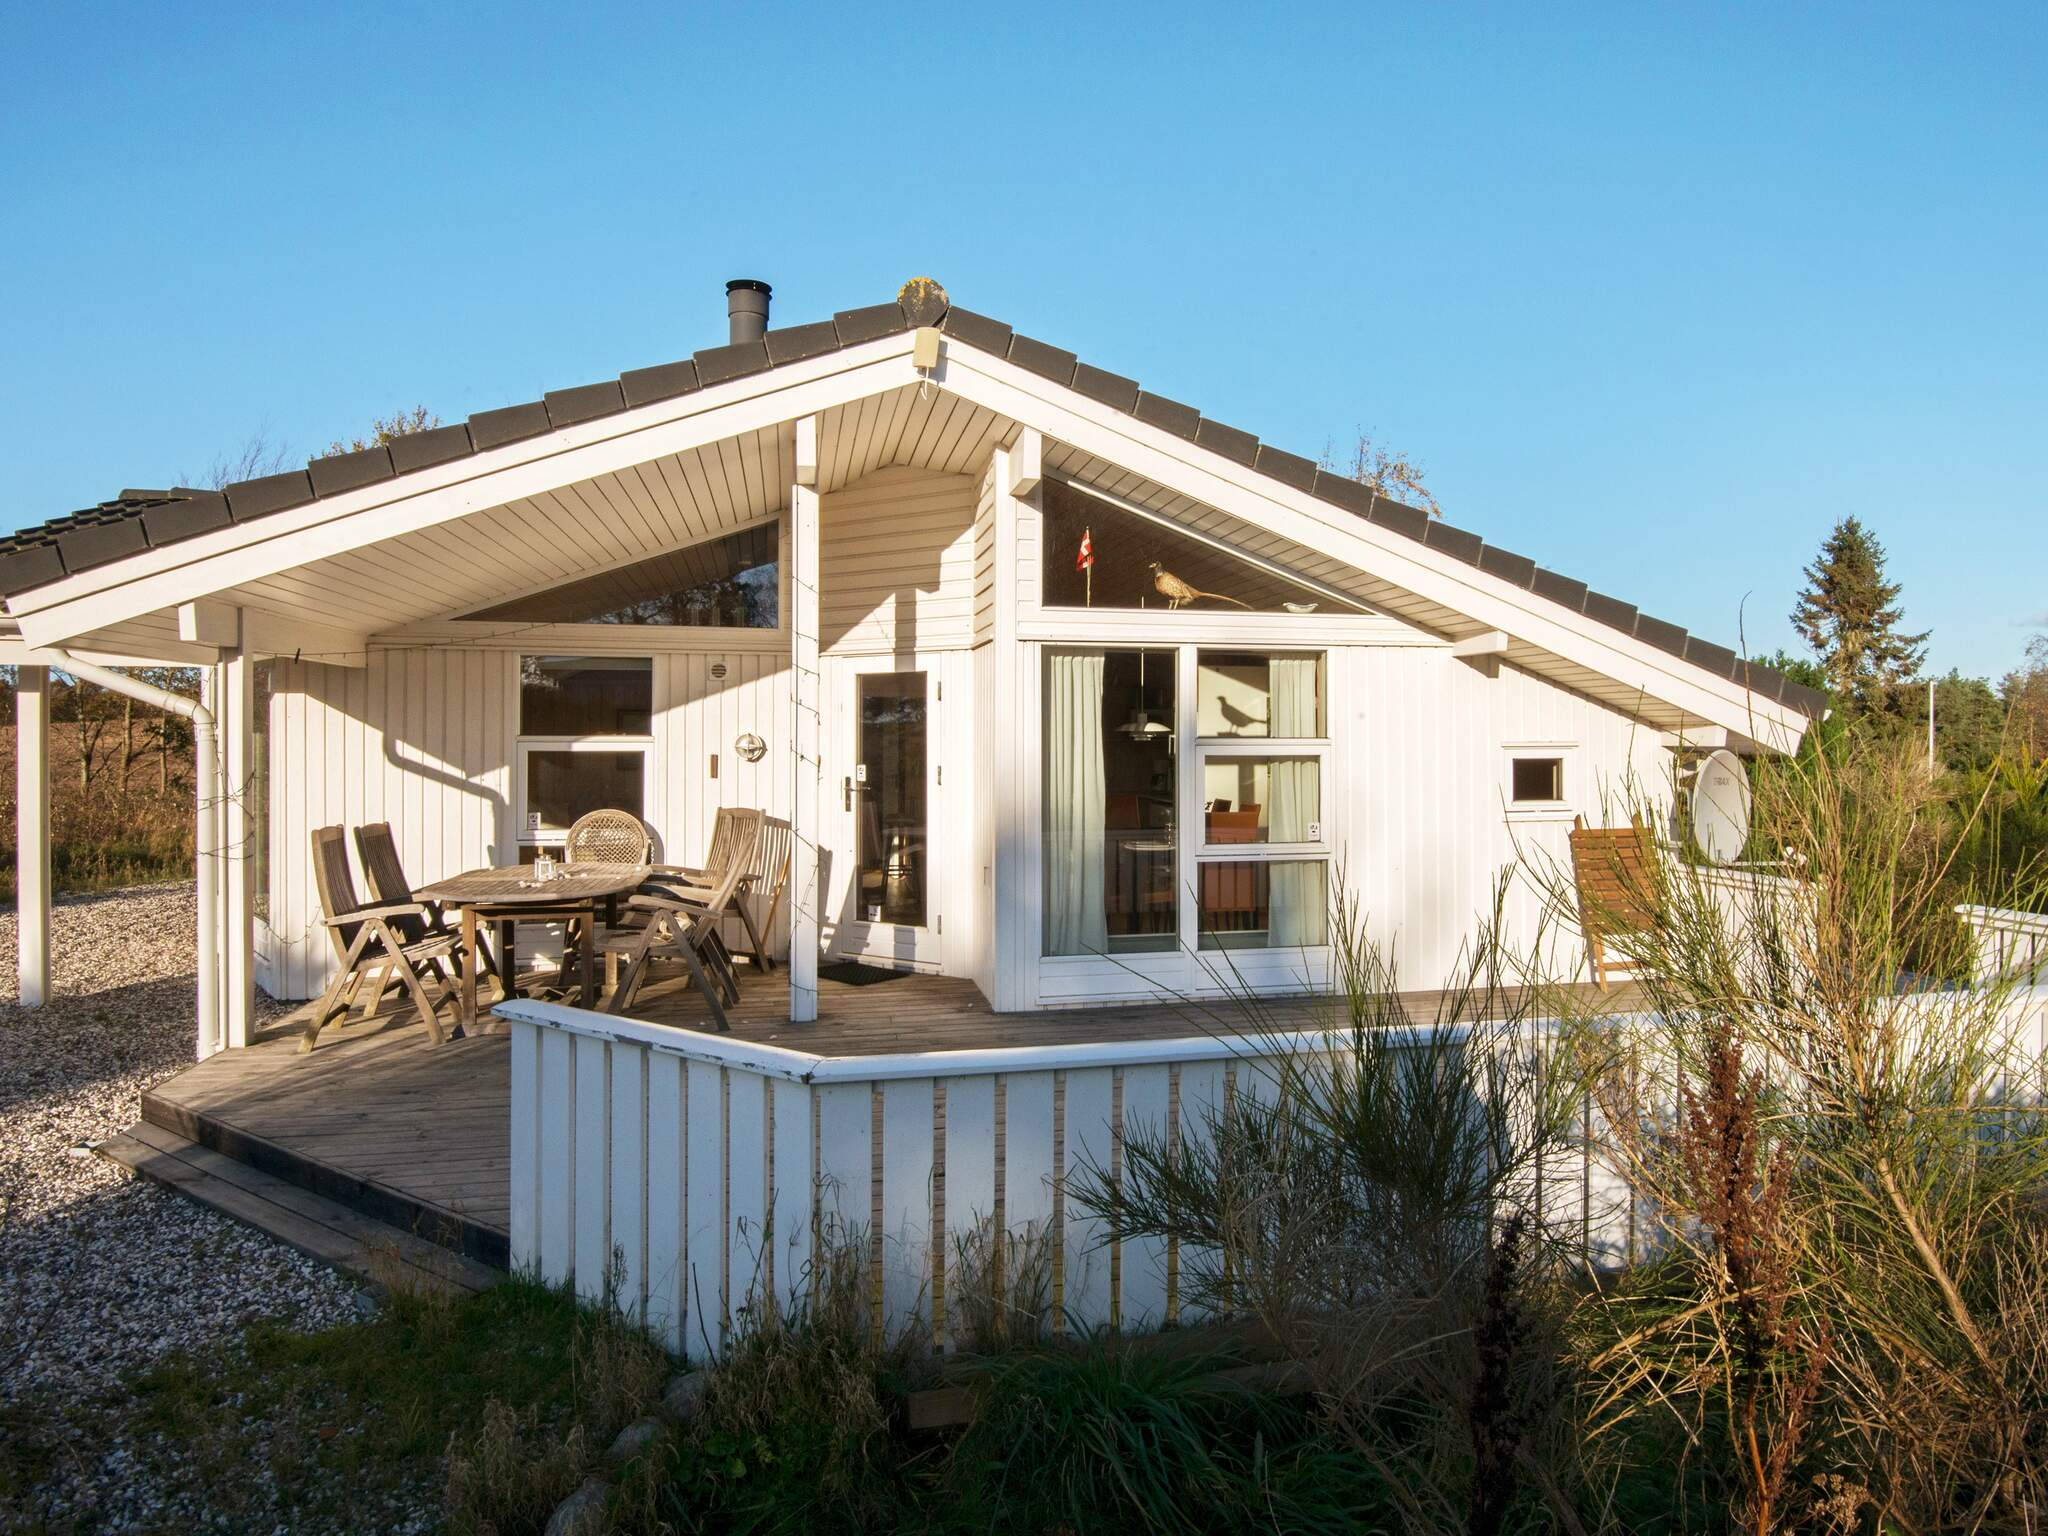 Maison de vacances Helgenæs (681779), Knebel, , Mer Baltique danoise, Danemark, image 14